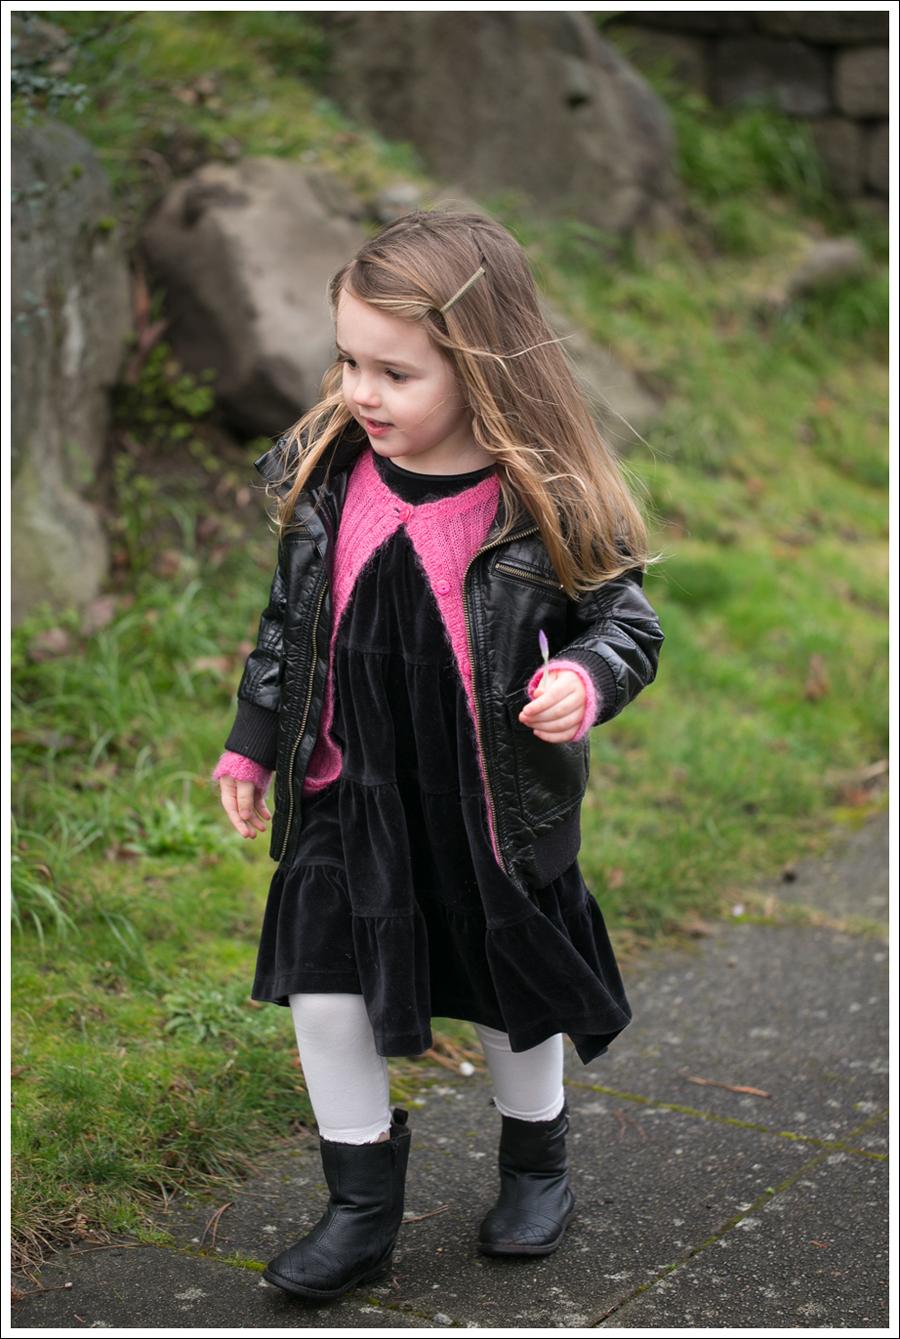 Blog HM Faux Leather Jacket Il etait une fee Cardigan Hanna Andersson Black Velour Twirl Dress Mexx Booties-7